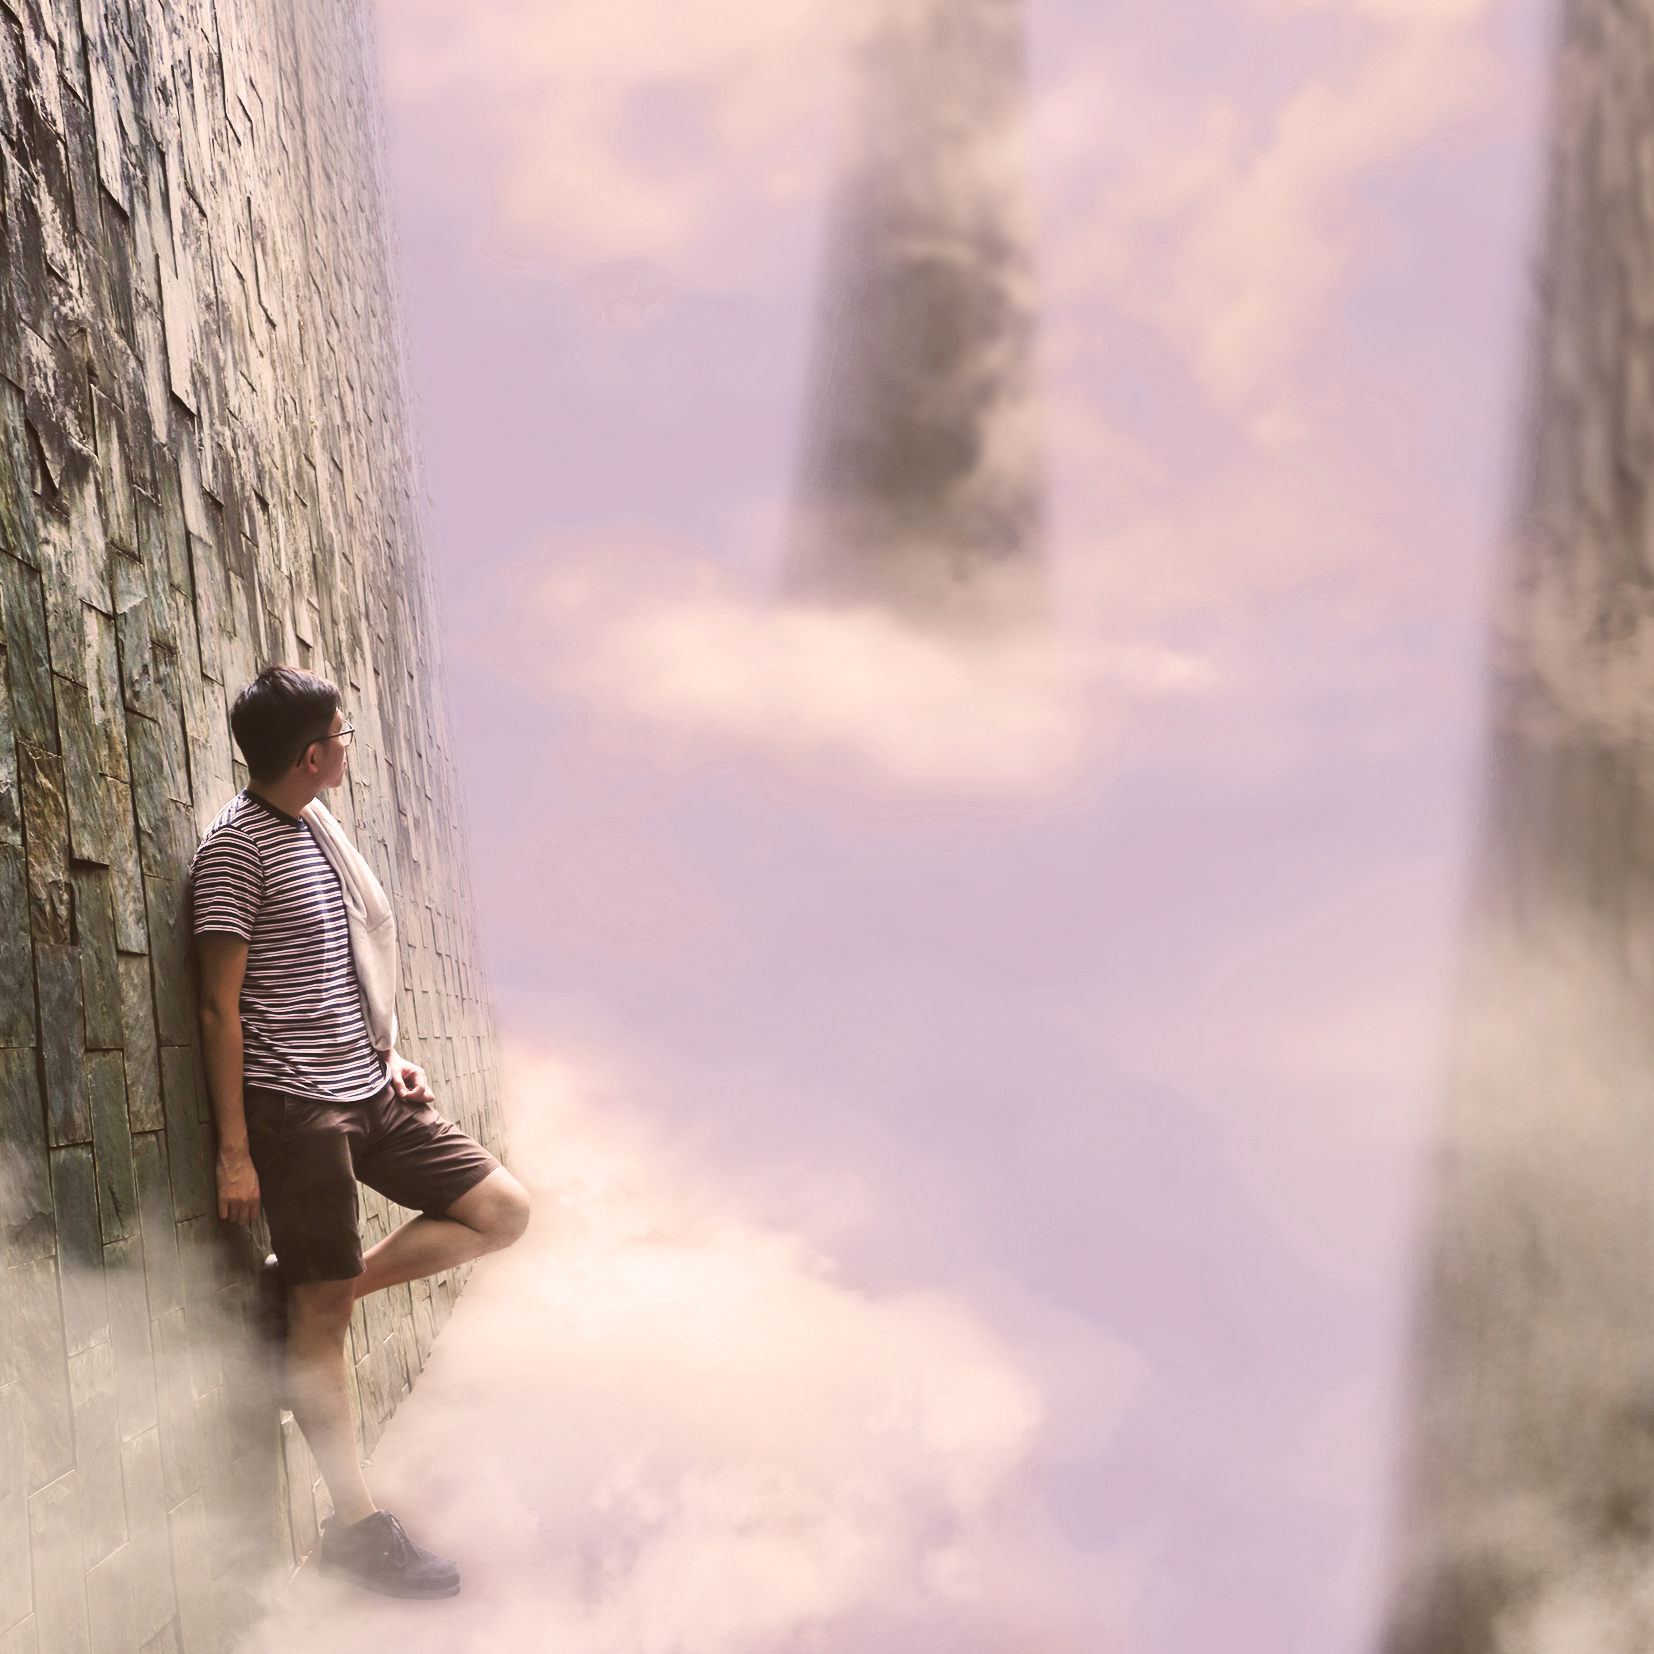 Skytopia Digital Art by Alvin Sim